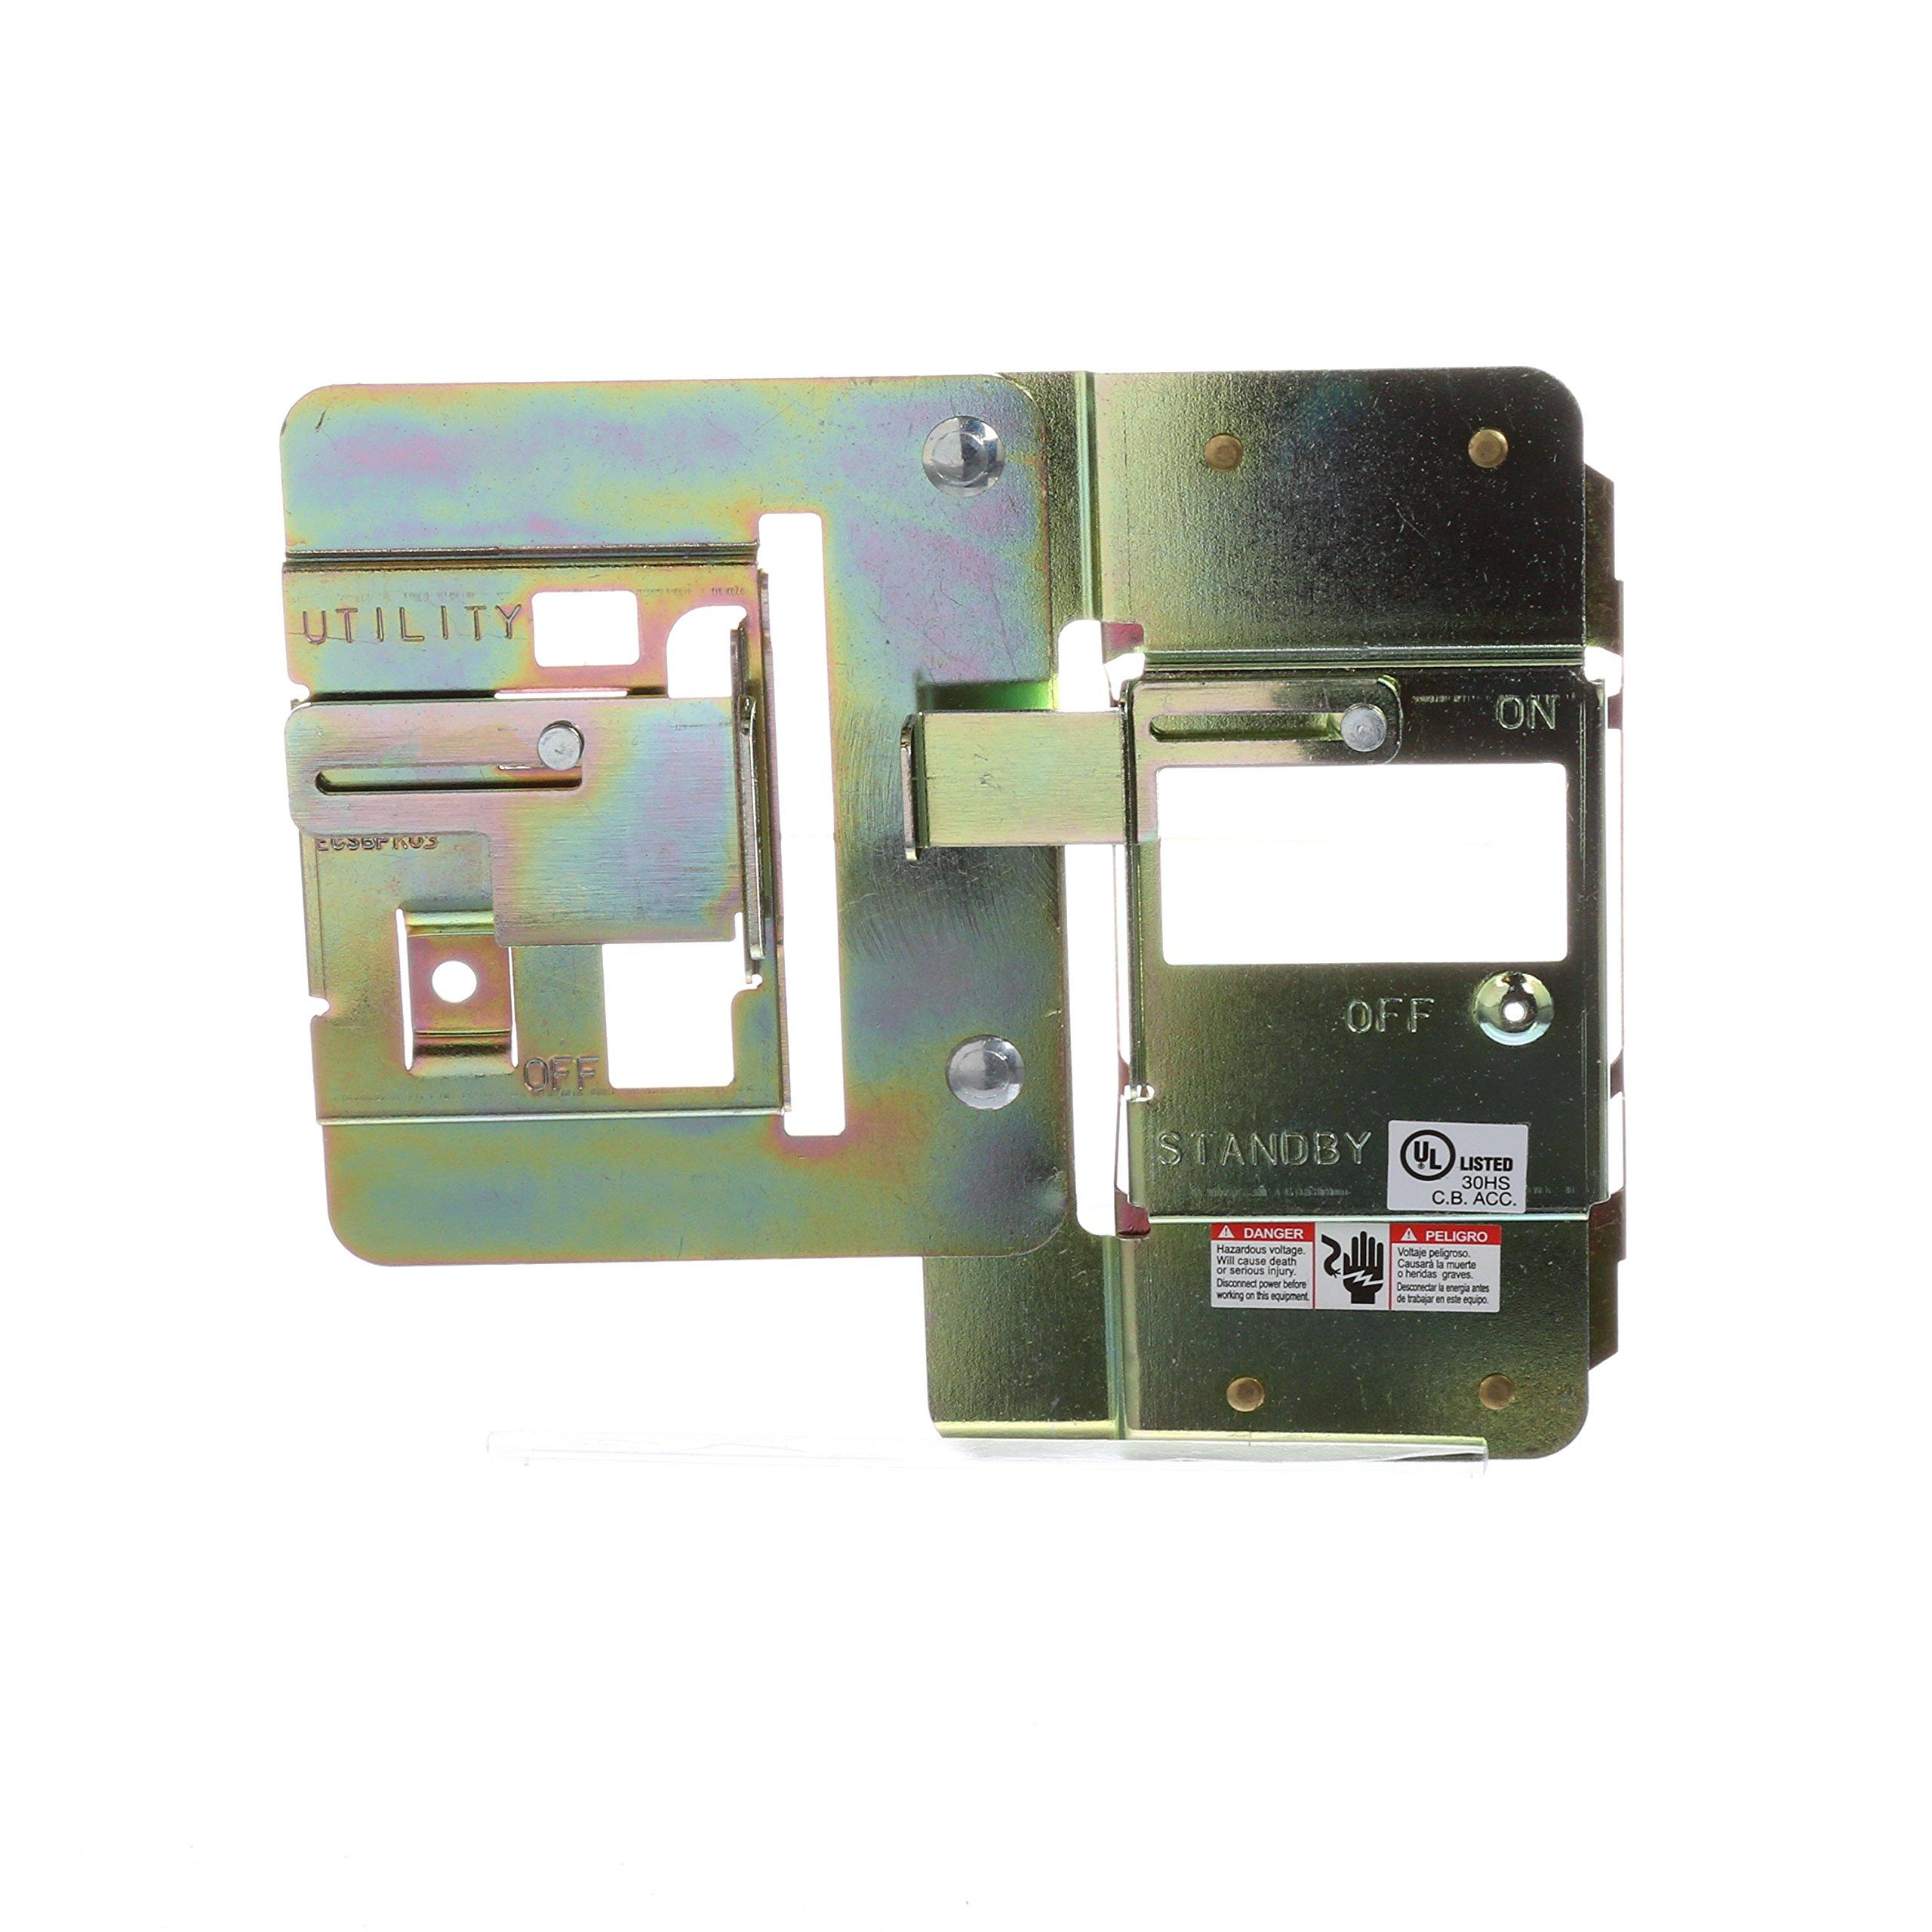 Siemens ECSBPK03 Generator Standby Power Mechanical Interlock by Siemens (Image #5)